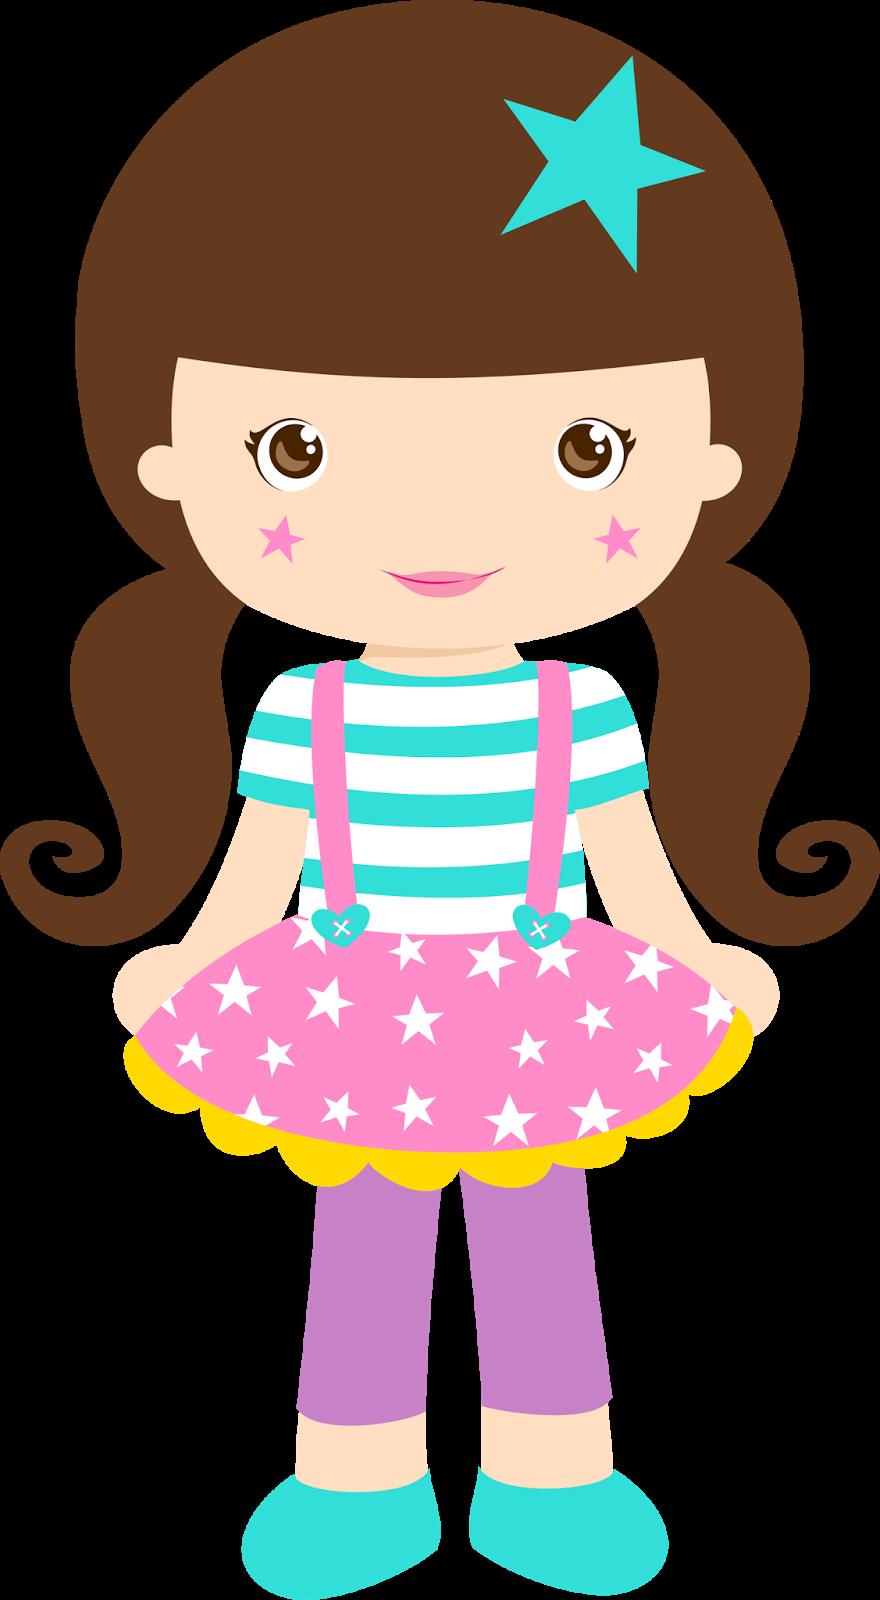 Cute little house clipart images image fondos dibujos circo - Buscar con Google | cute little girls ... image